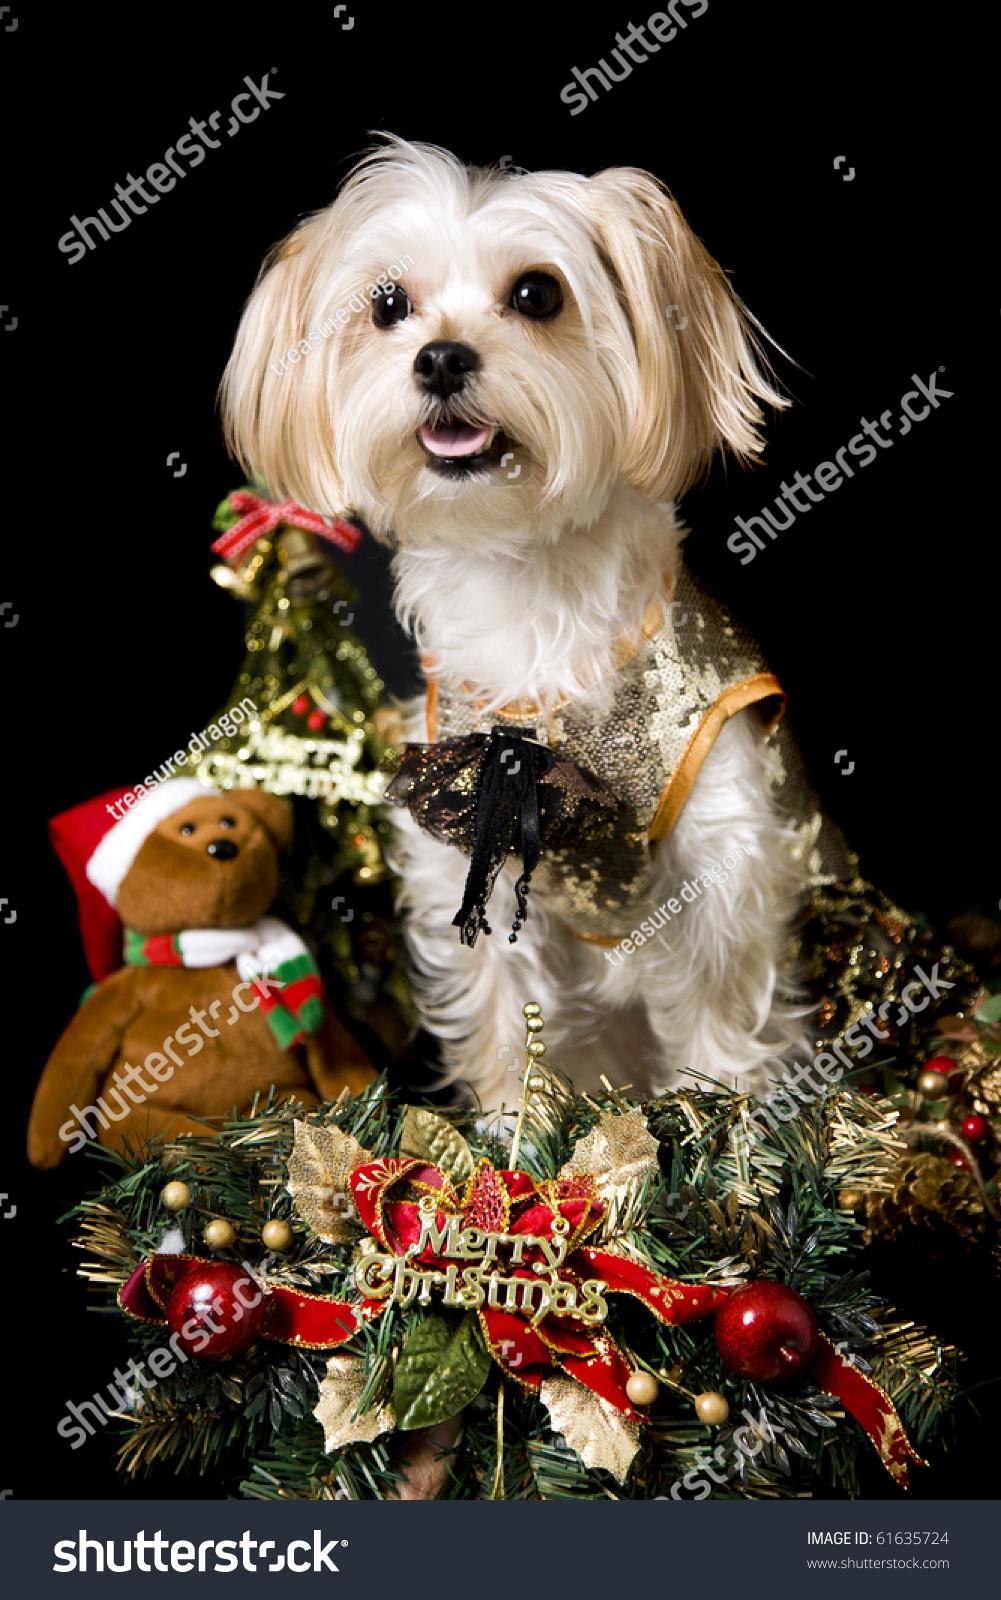 Maltese christmas ornaments - Save To A Lightbox